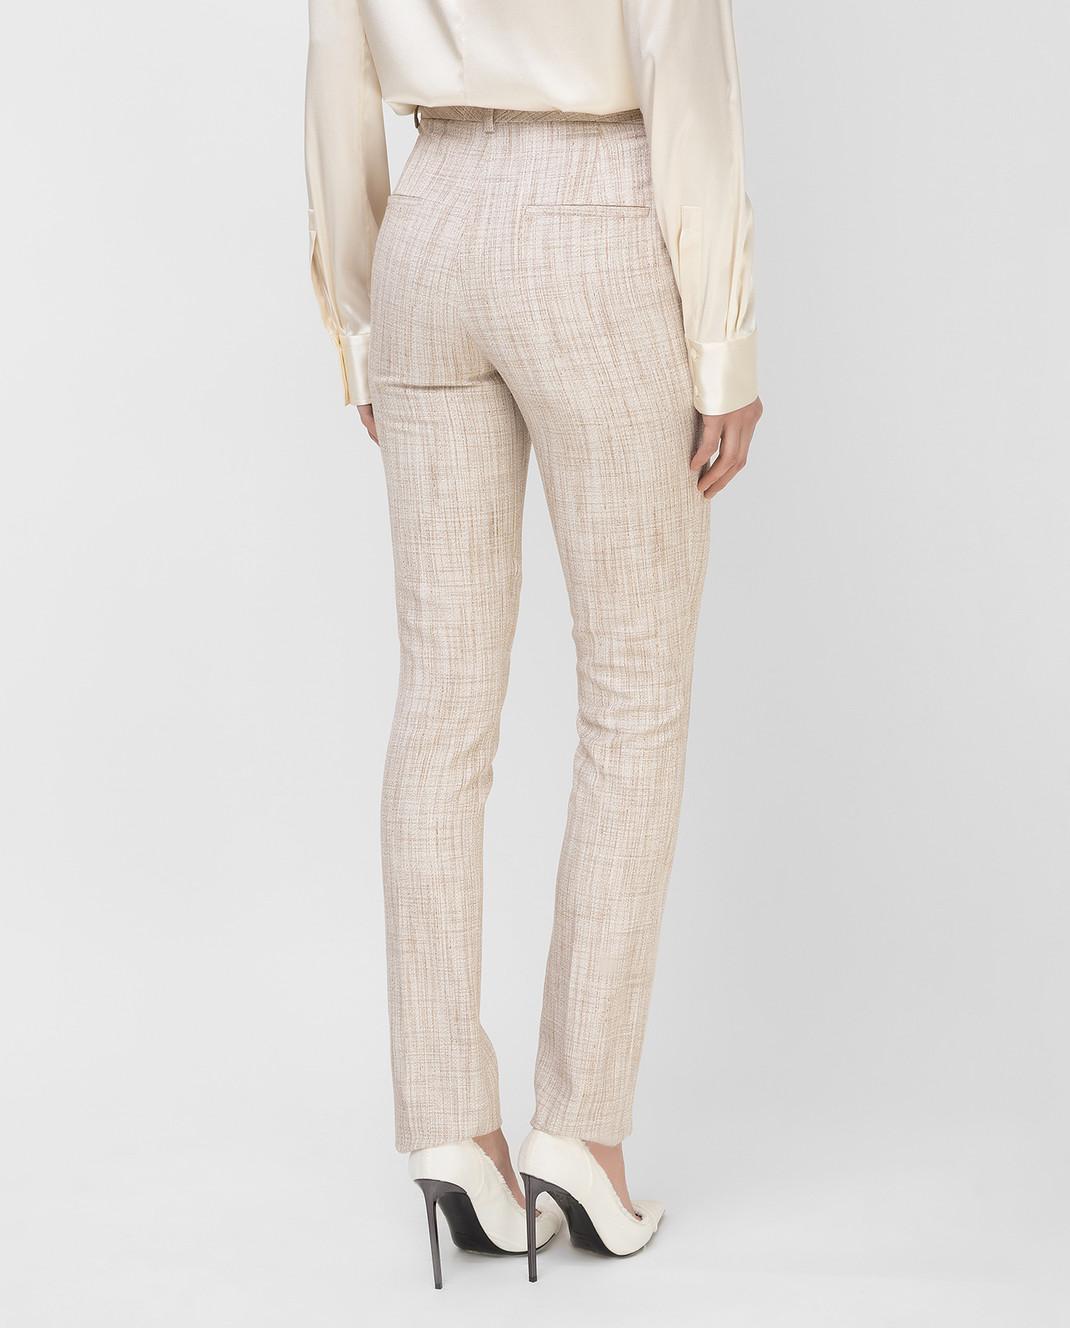 Victoria Beckham Бежевые брюки TRSLM2402 изображение 4